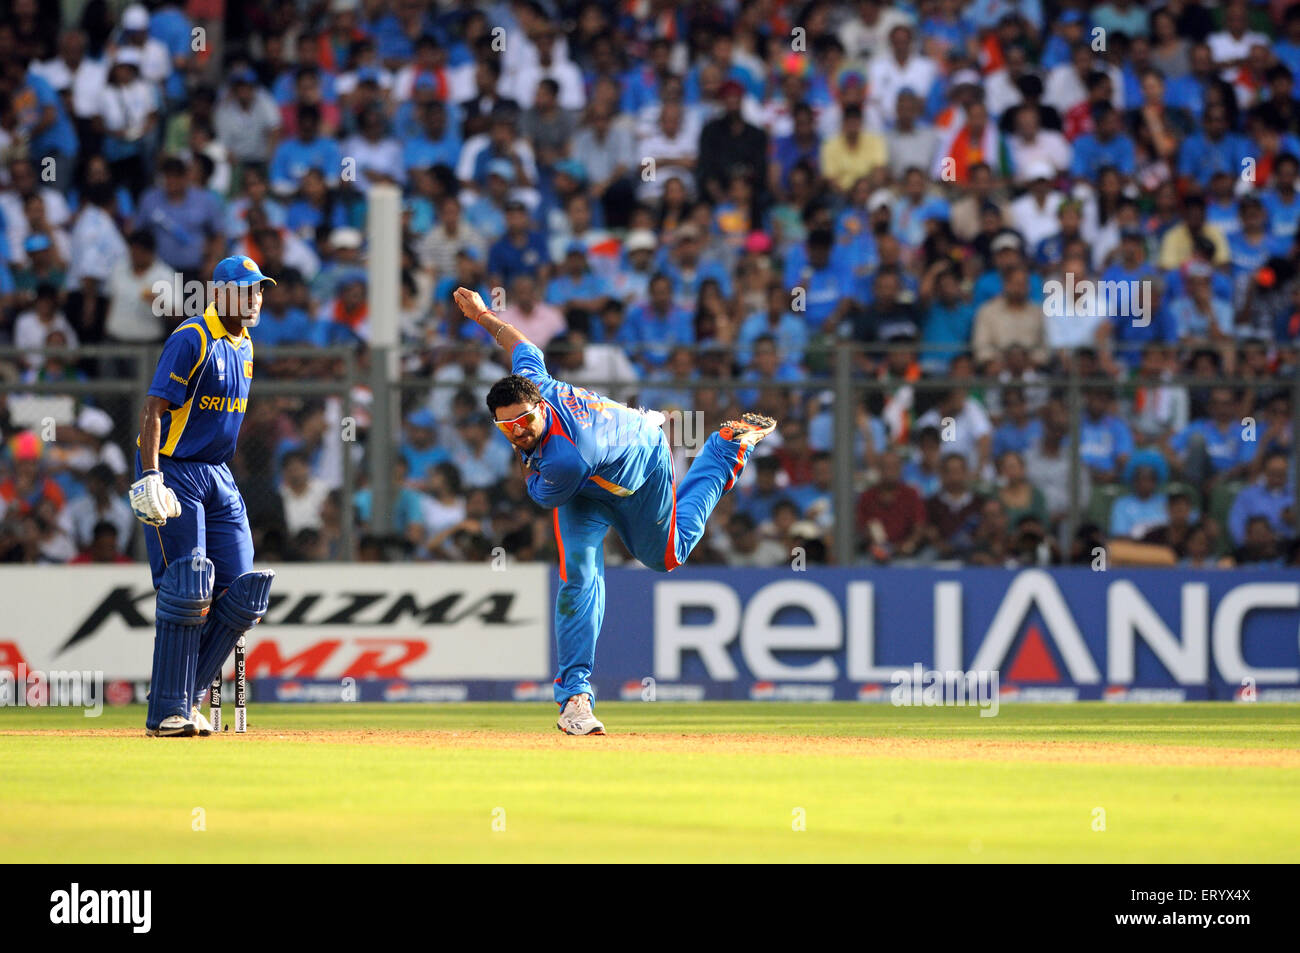 Sri Lankan batsman Thilan Samaraweera ICC Cricket World Cup finals Wankhede stadium Mumbai - Stock Image